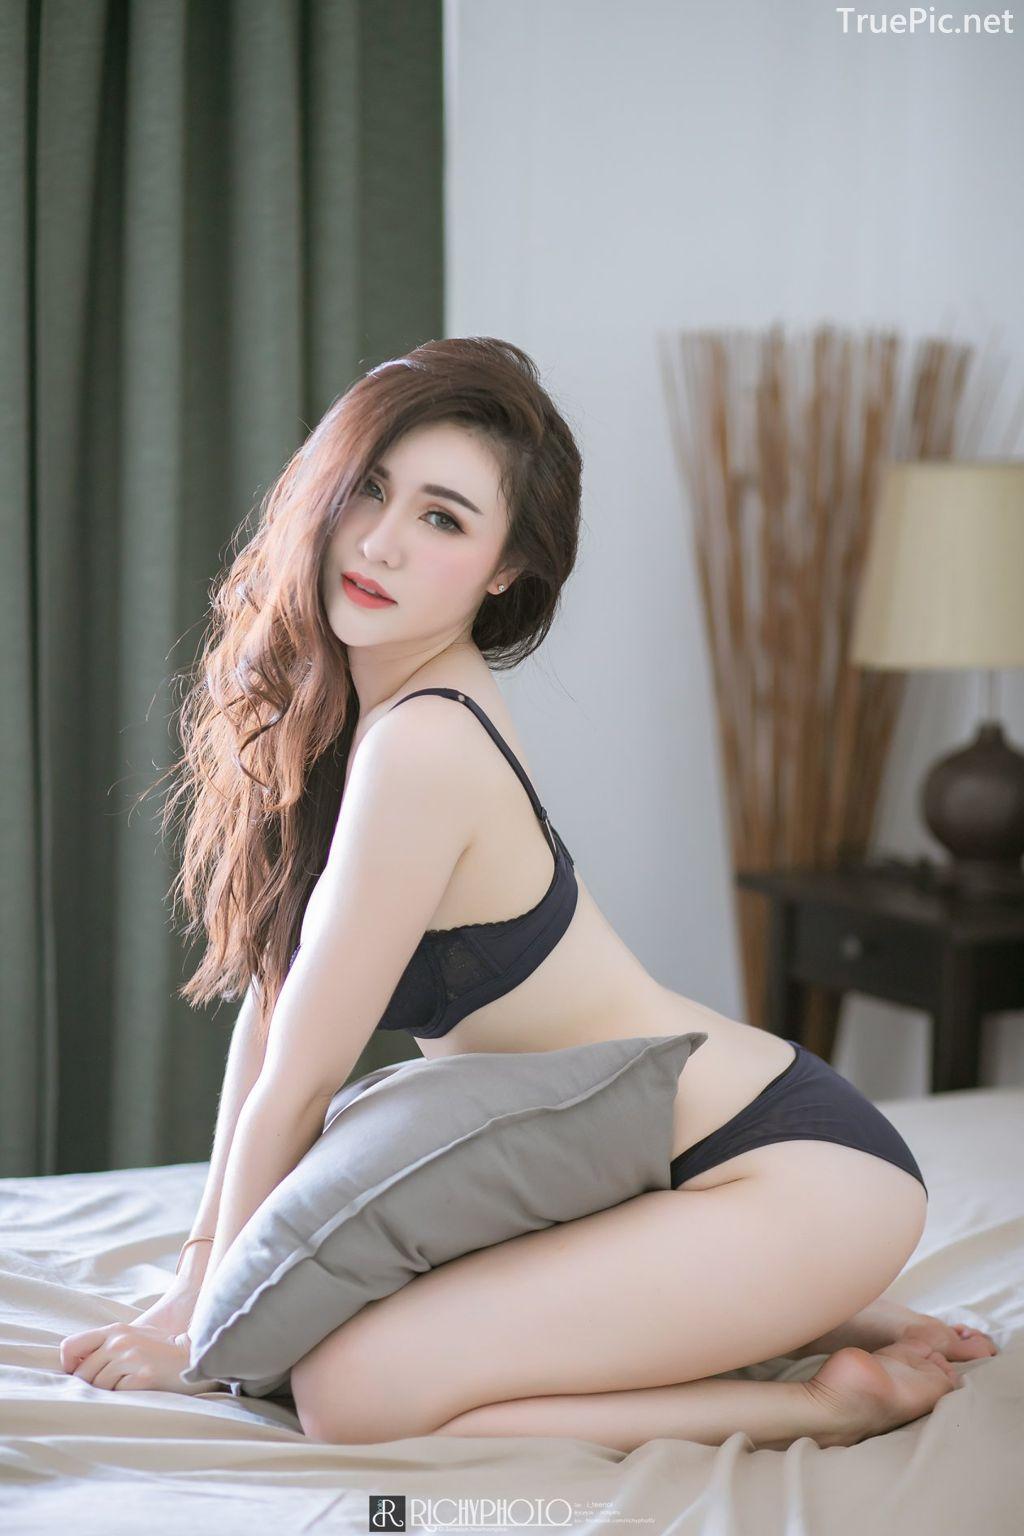 Image-Thailand-Model-Cherry-Pawan-Jaroeninlaphat-Sexy-Black-Lingerie-TruePic.net- Picture-3